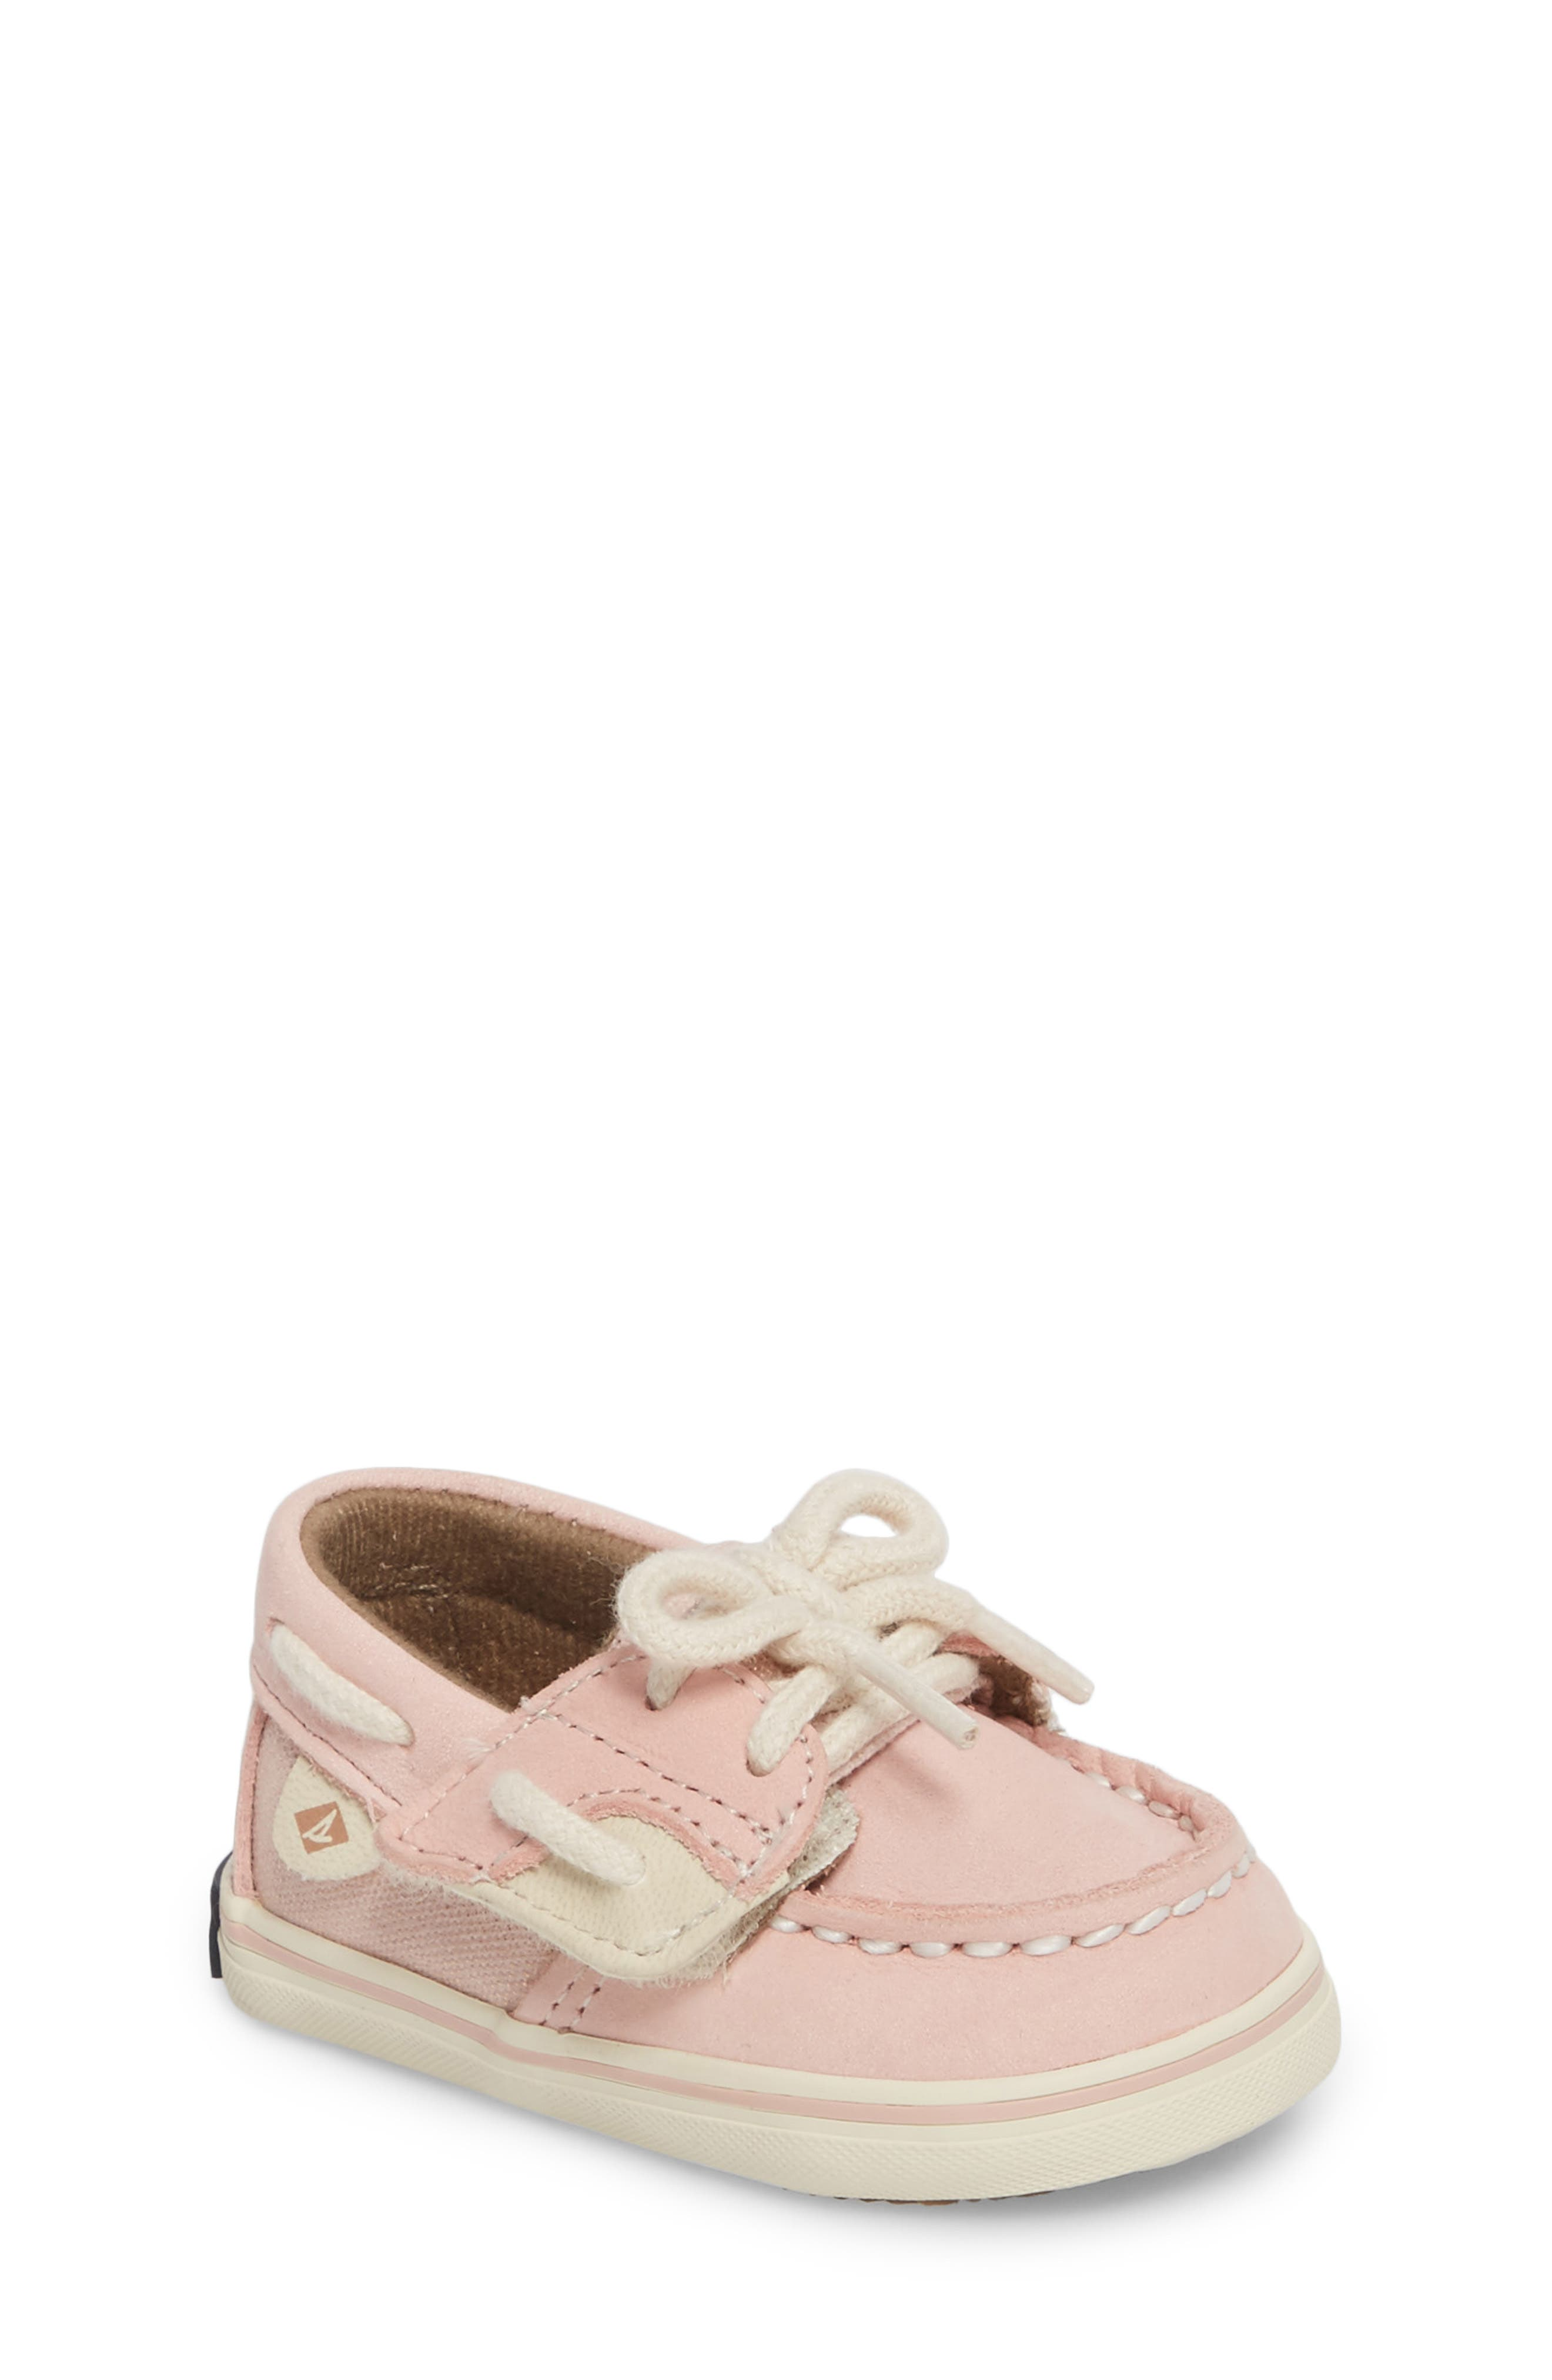 Sperry Bluefish Crib Jr. Boat Shoe (Baby)